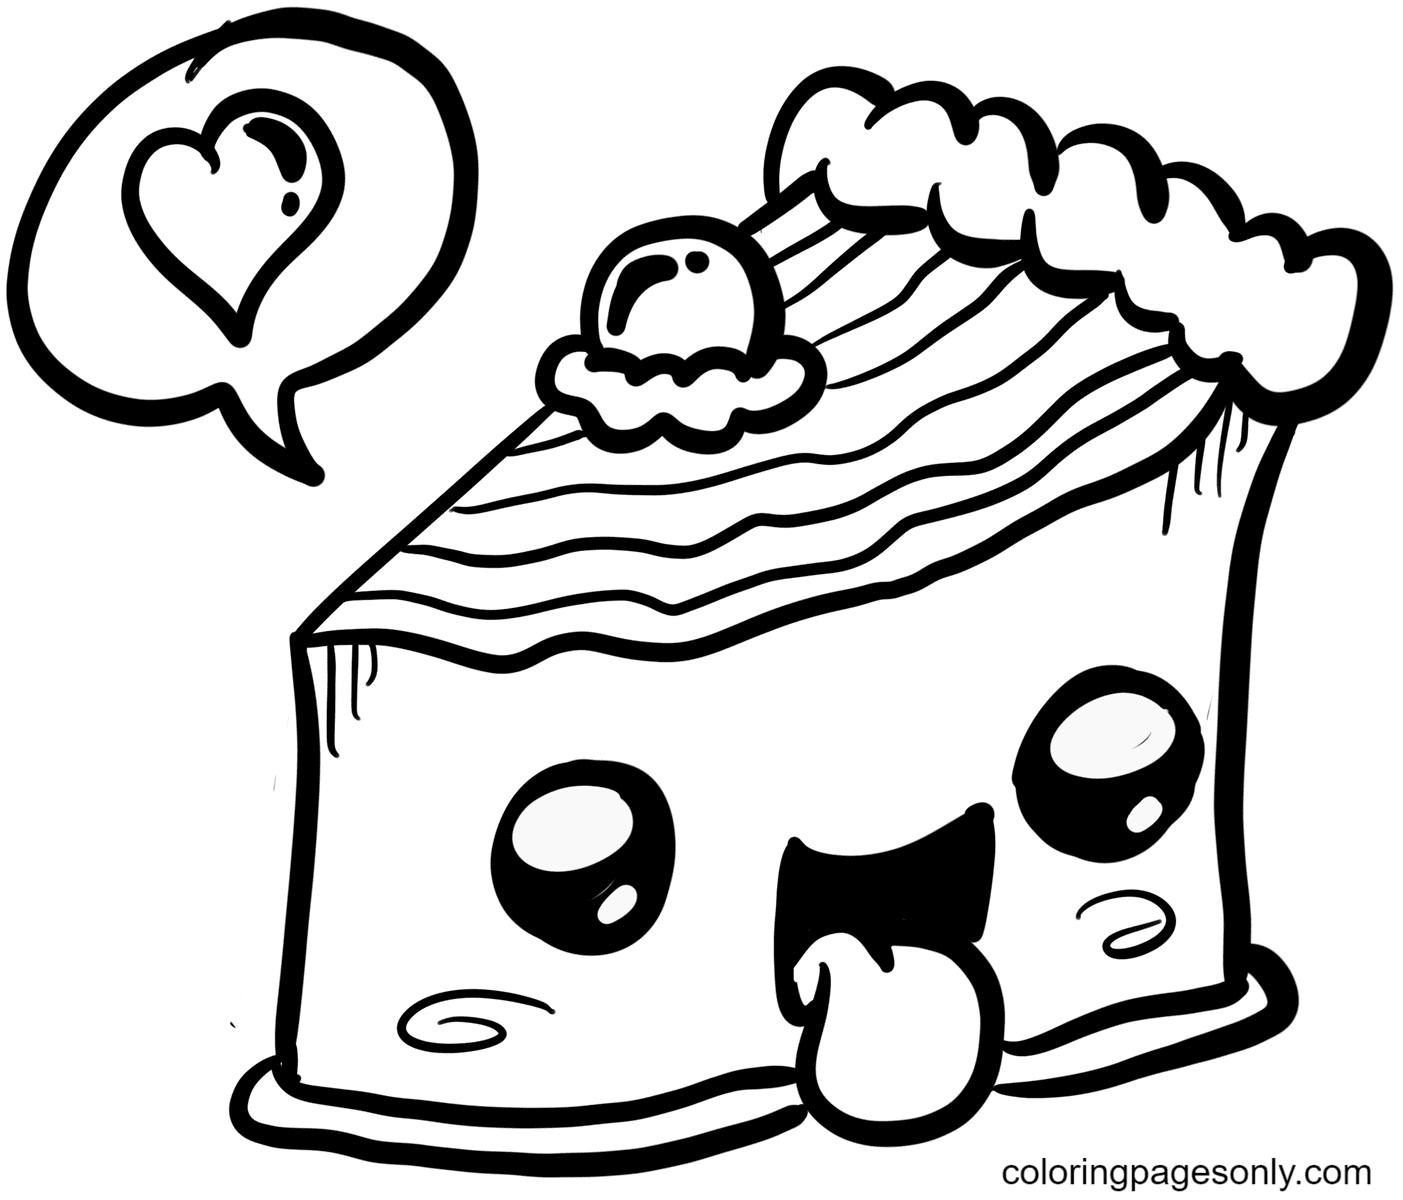 Kawaii Delicious Cake Food Coloring Page